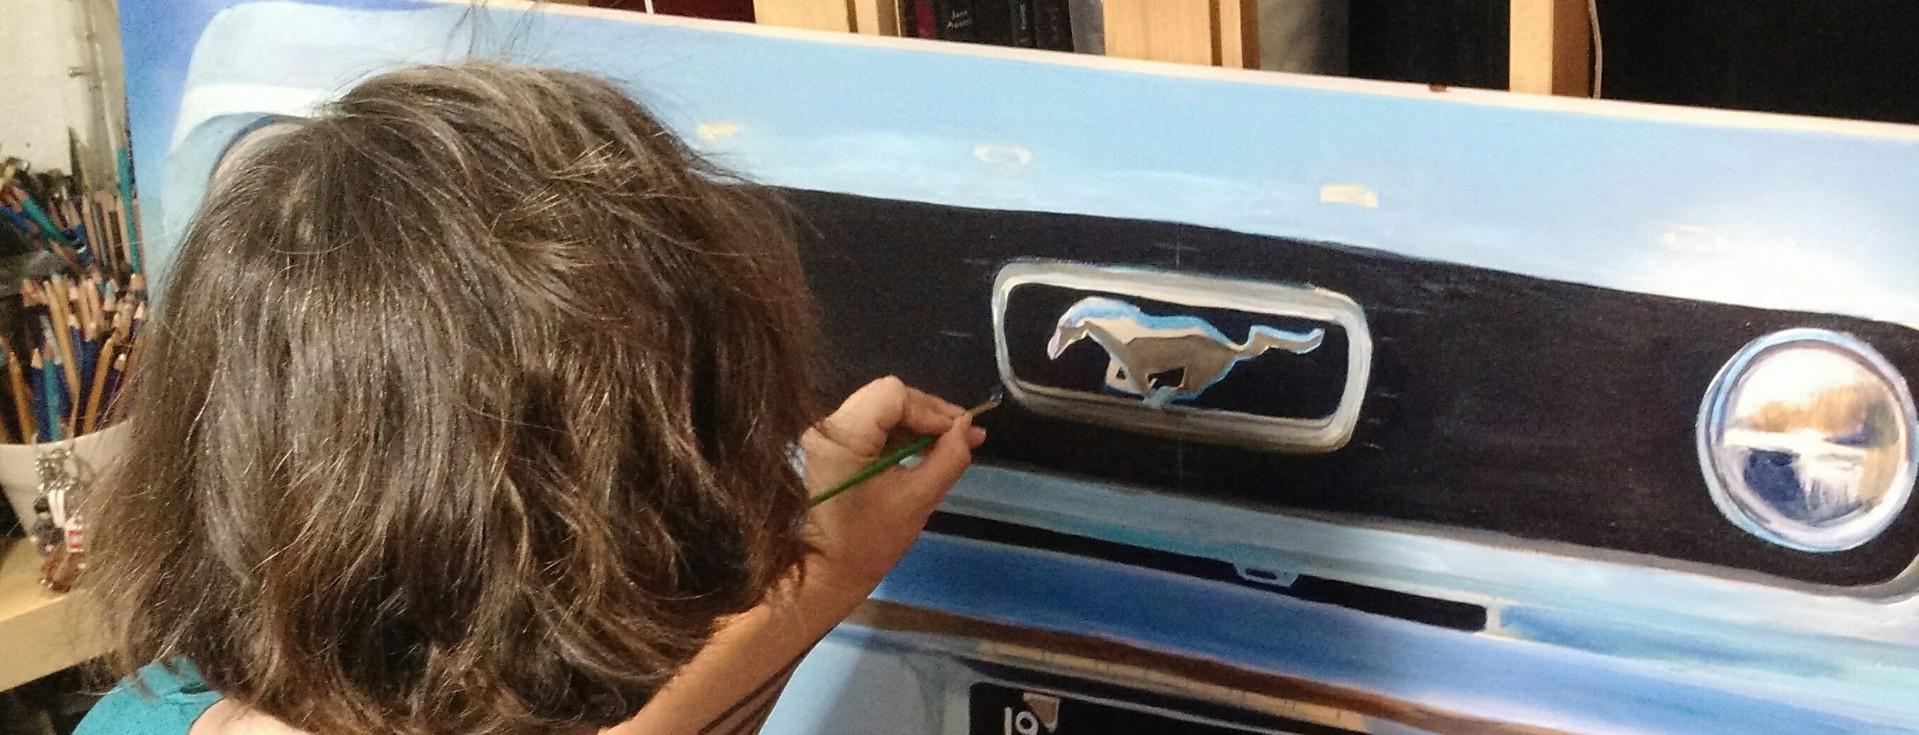 1966 Arctic Blue Mustang by Shan Fannin